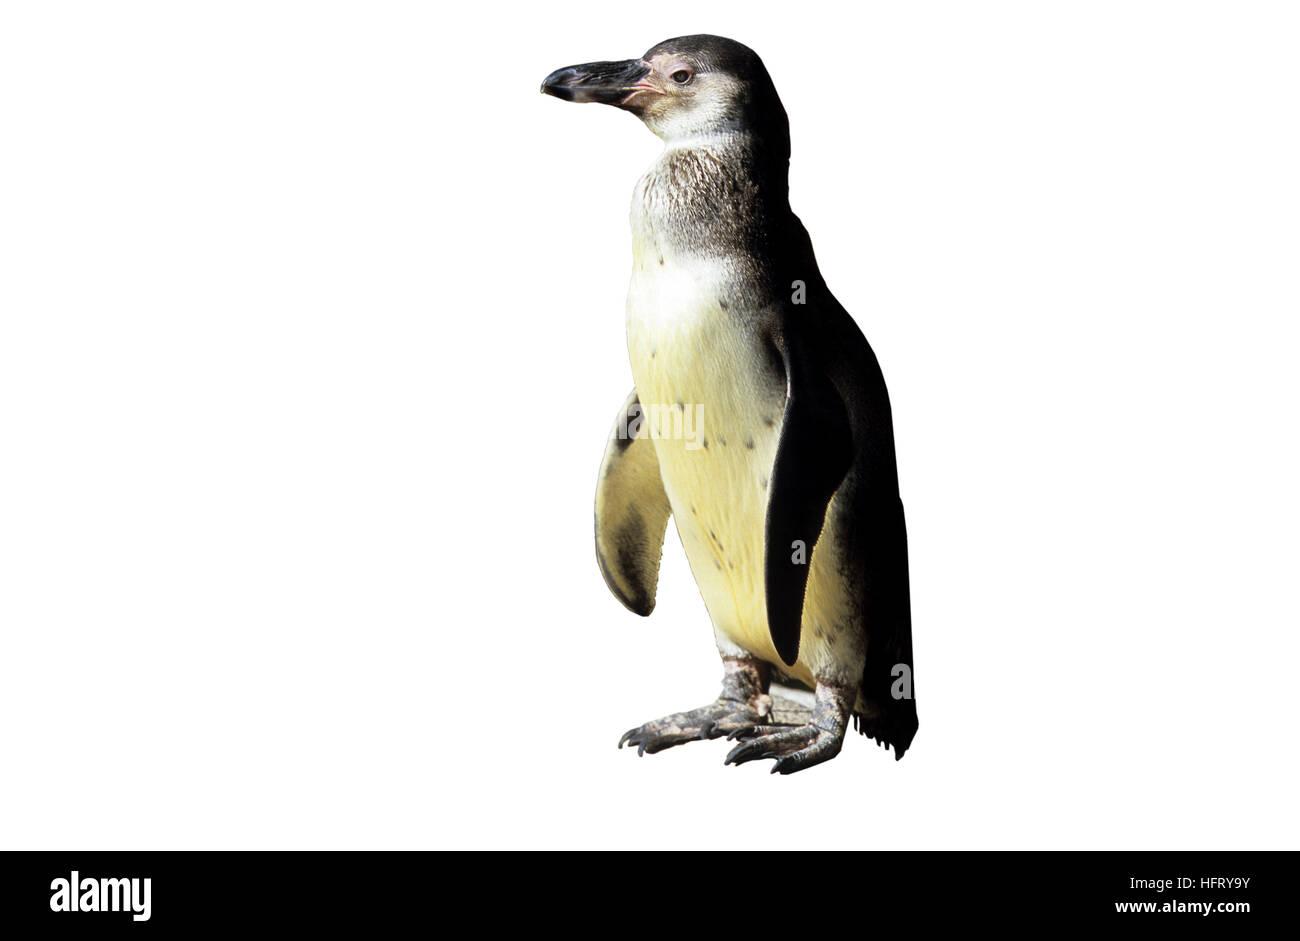 Penguin Cut Out Stockfotos Bilder